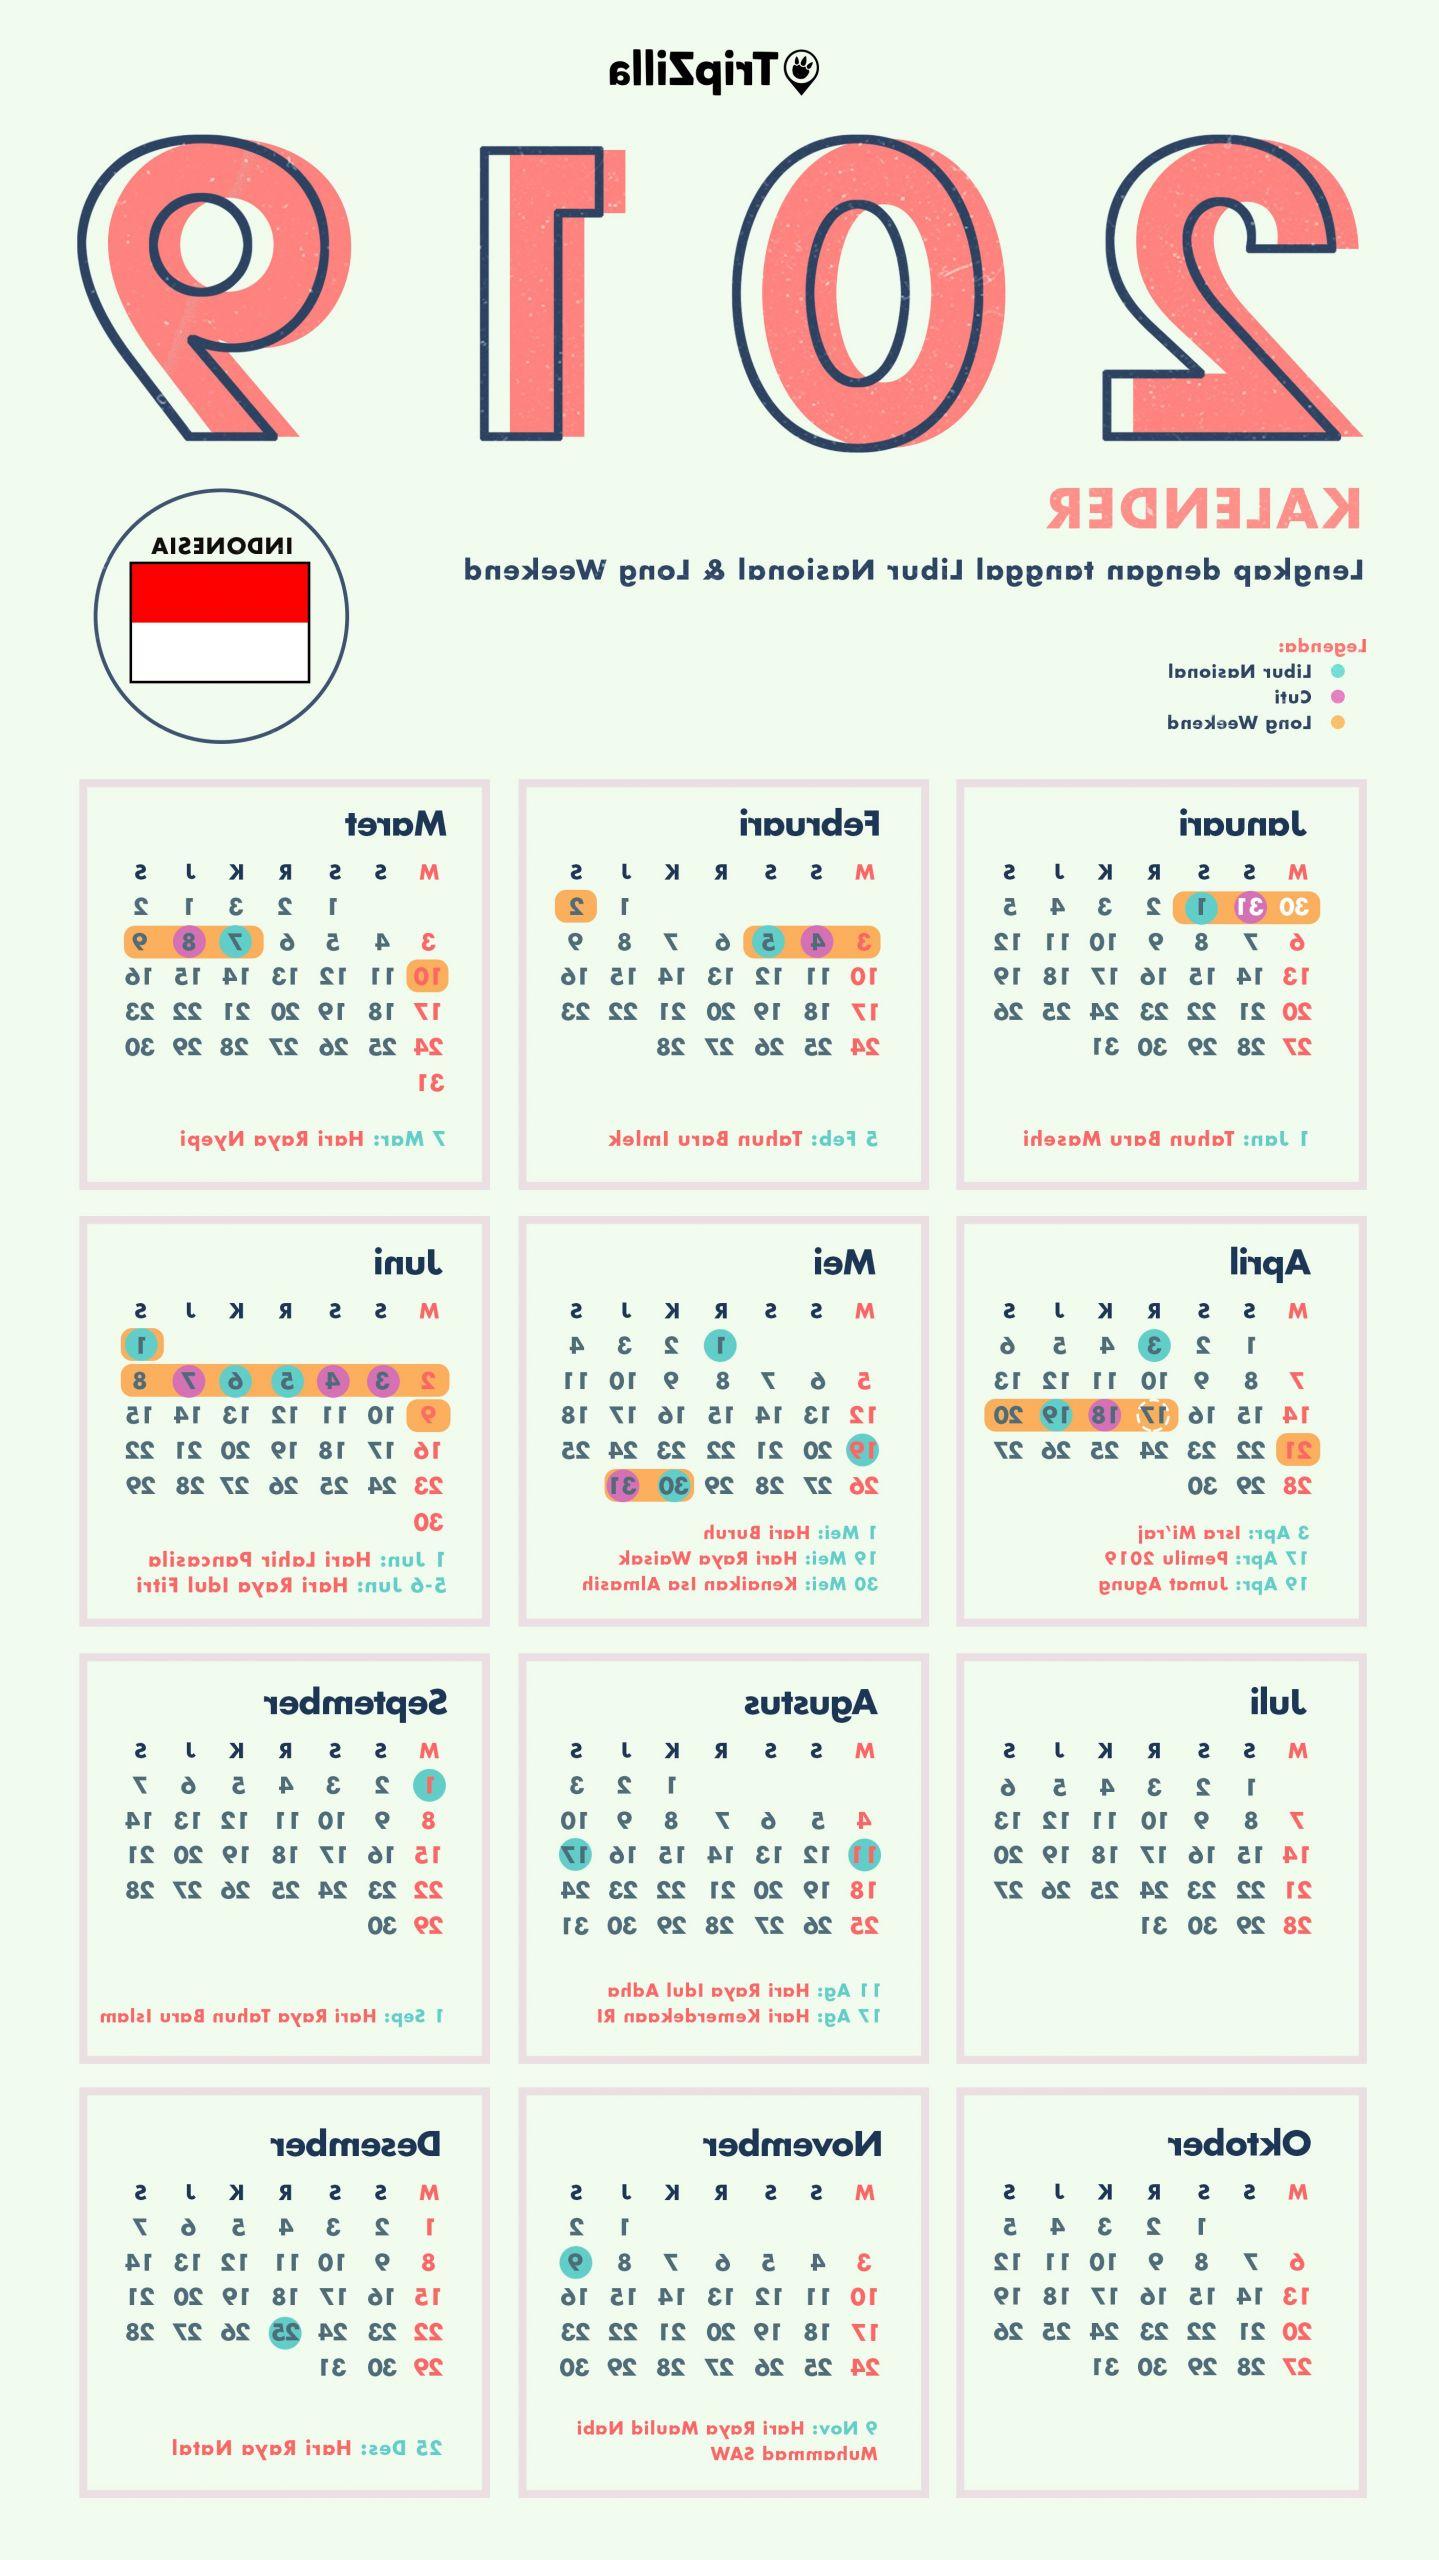 Model Baju Lebaran Tahun 2019 Ipdd Lebaran Tahun 2019 Jatuh Pada Tanggal Berapa Ramadhan Gg